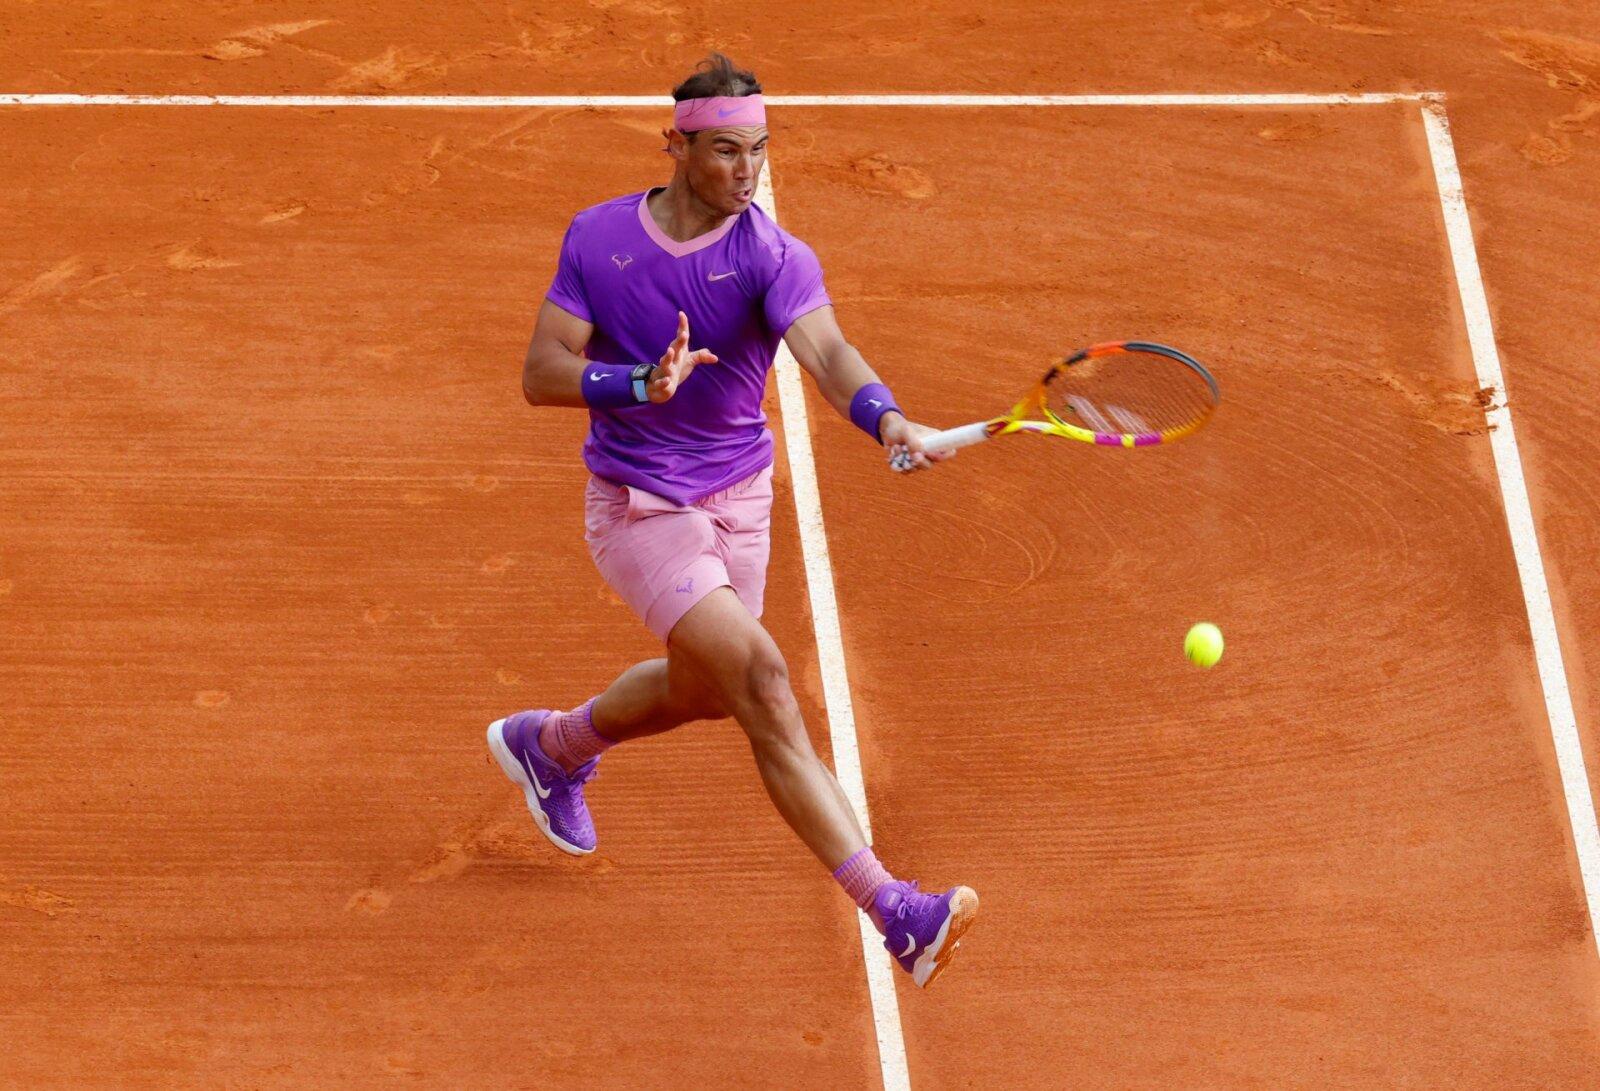 Barcelona Open 2021: Rafael Nadal vs. Ilya Ivashka Tennis Pick and Prediction